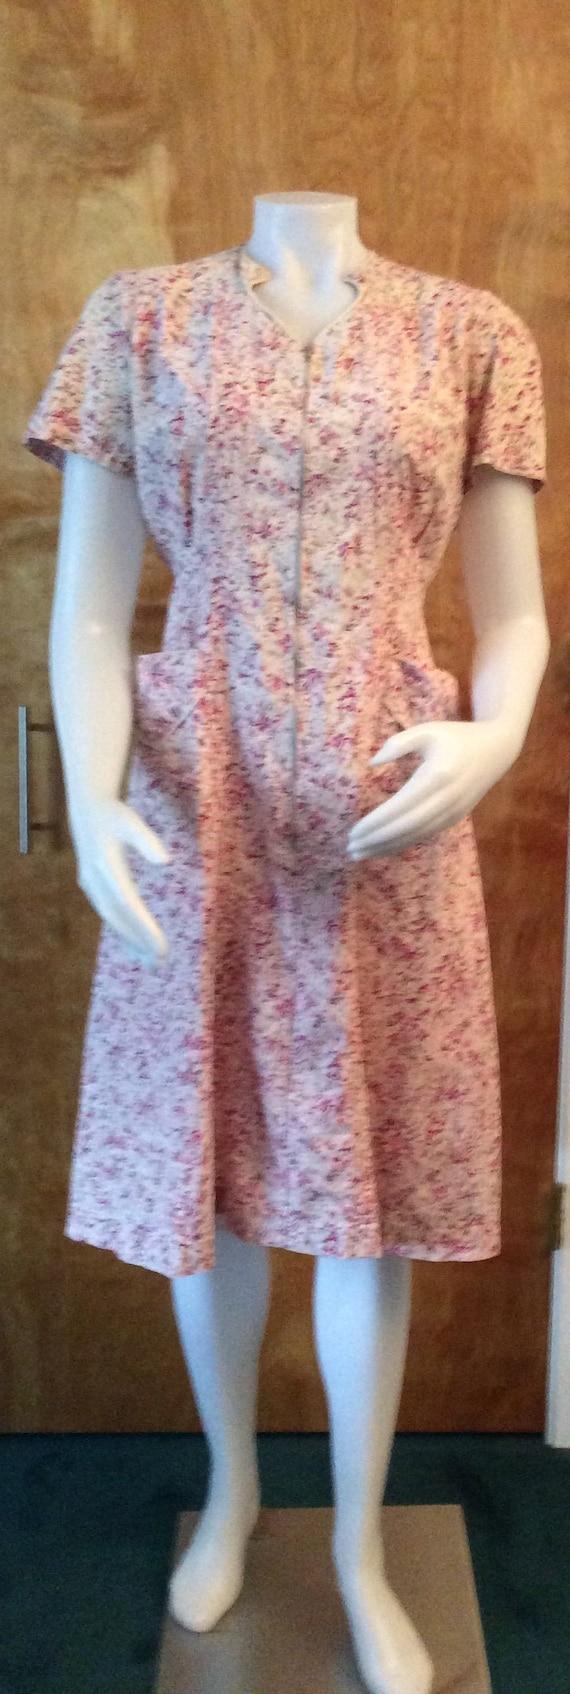 1940s house dress by NIP-N-TUCK zipper front pink